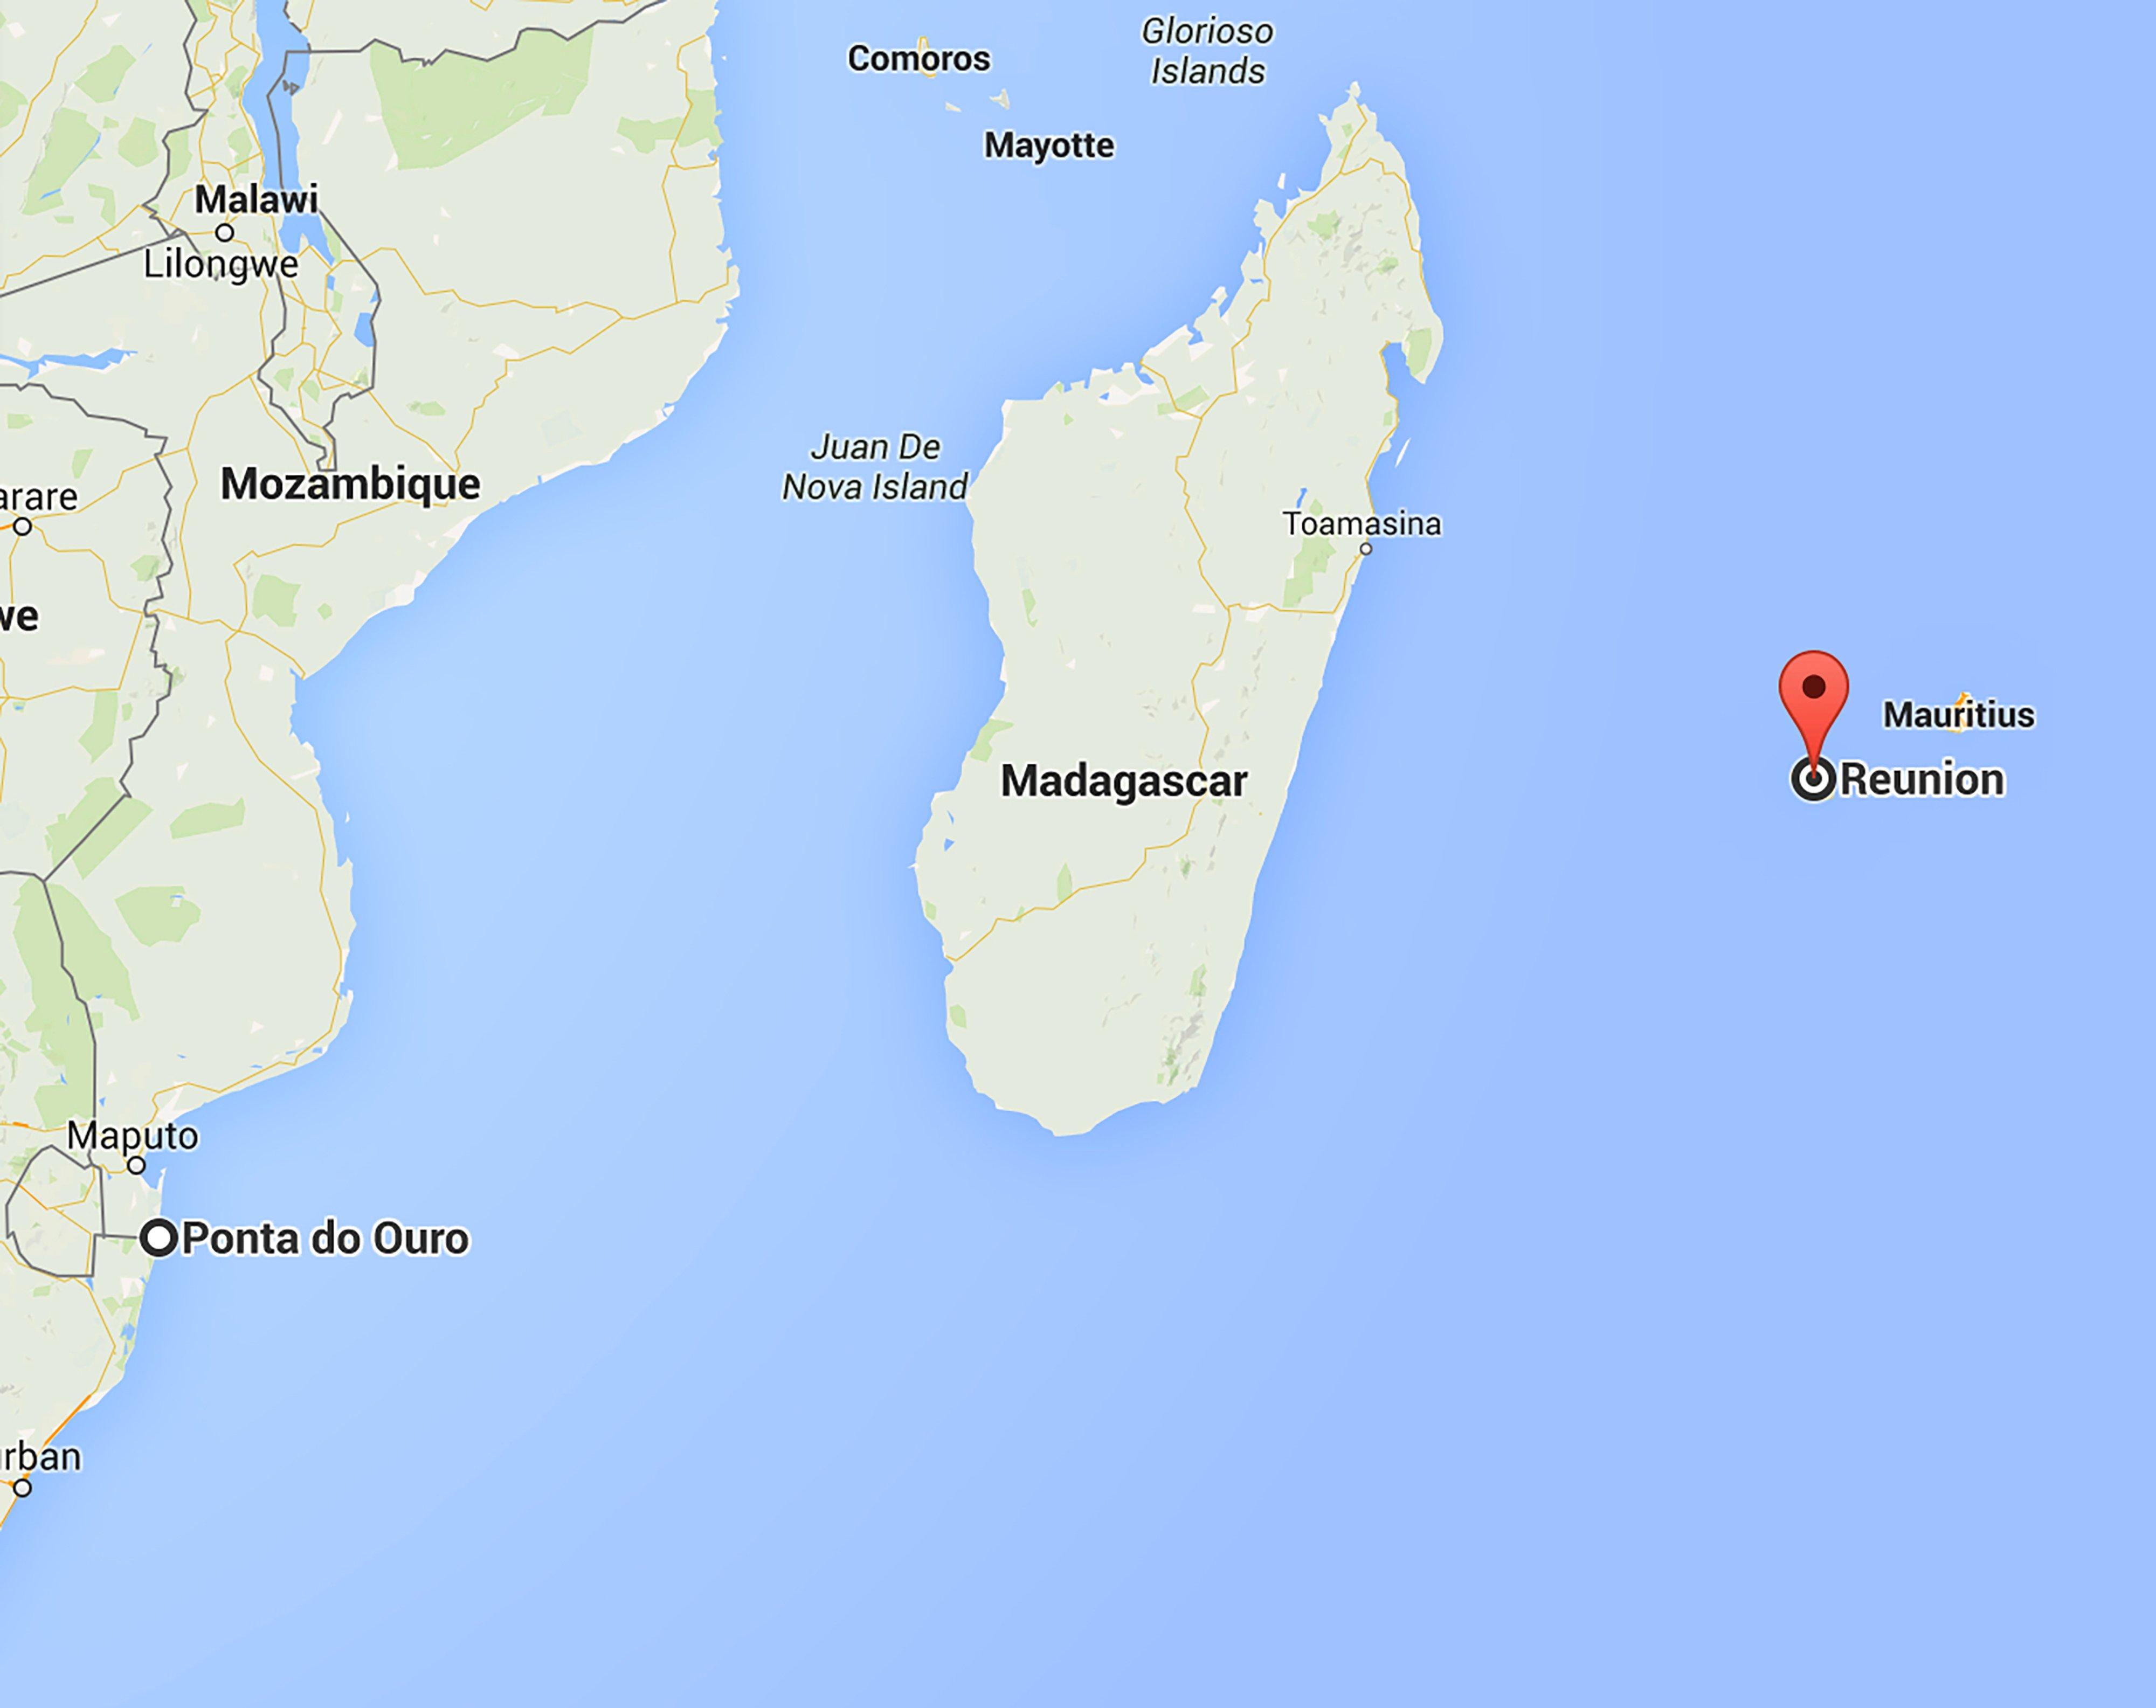 DALY ryan - cosmo shark map